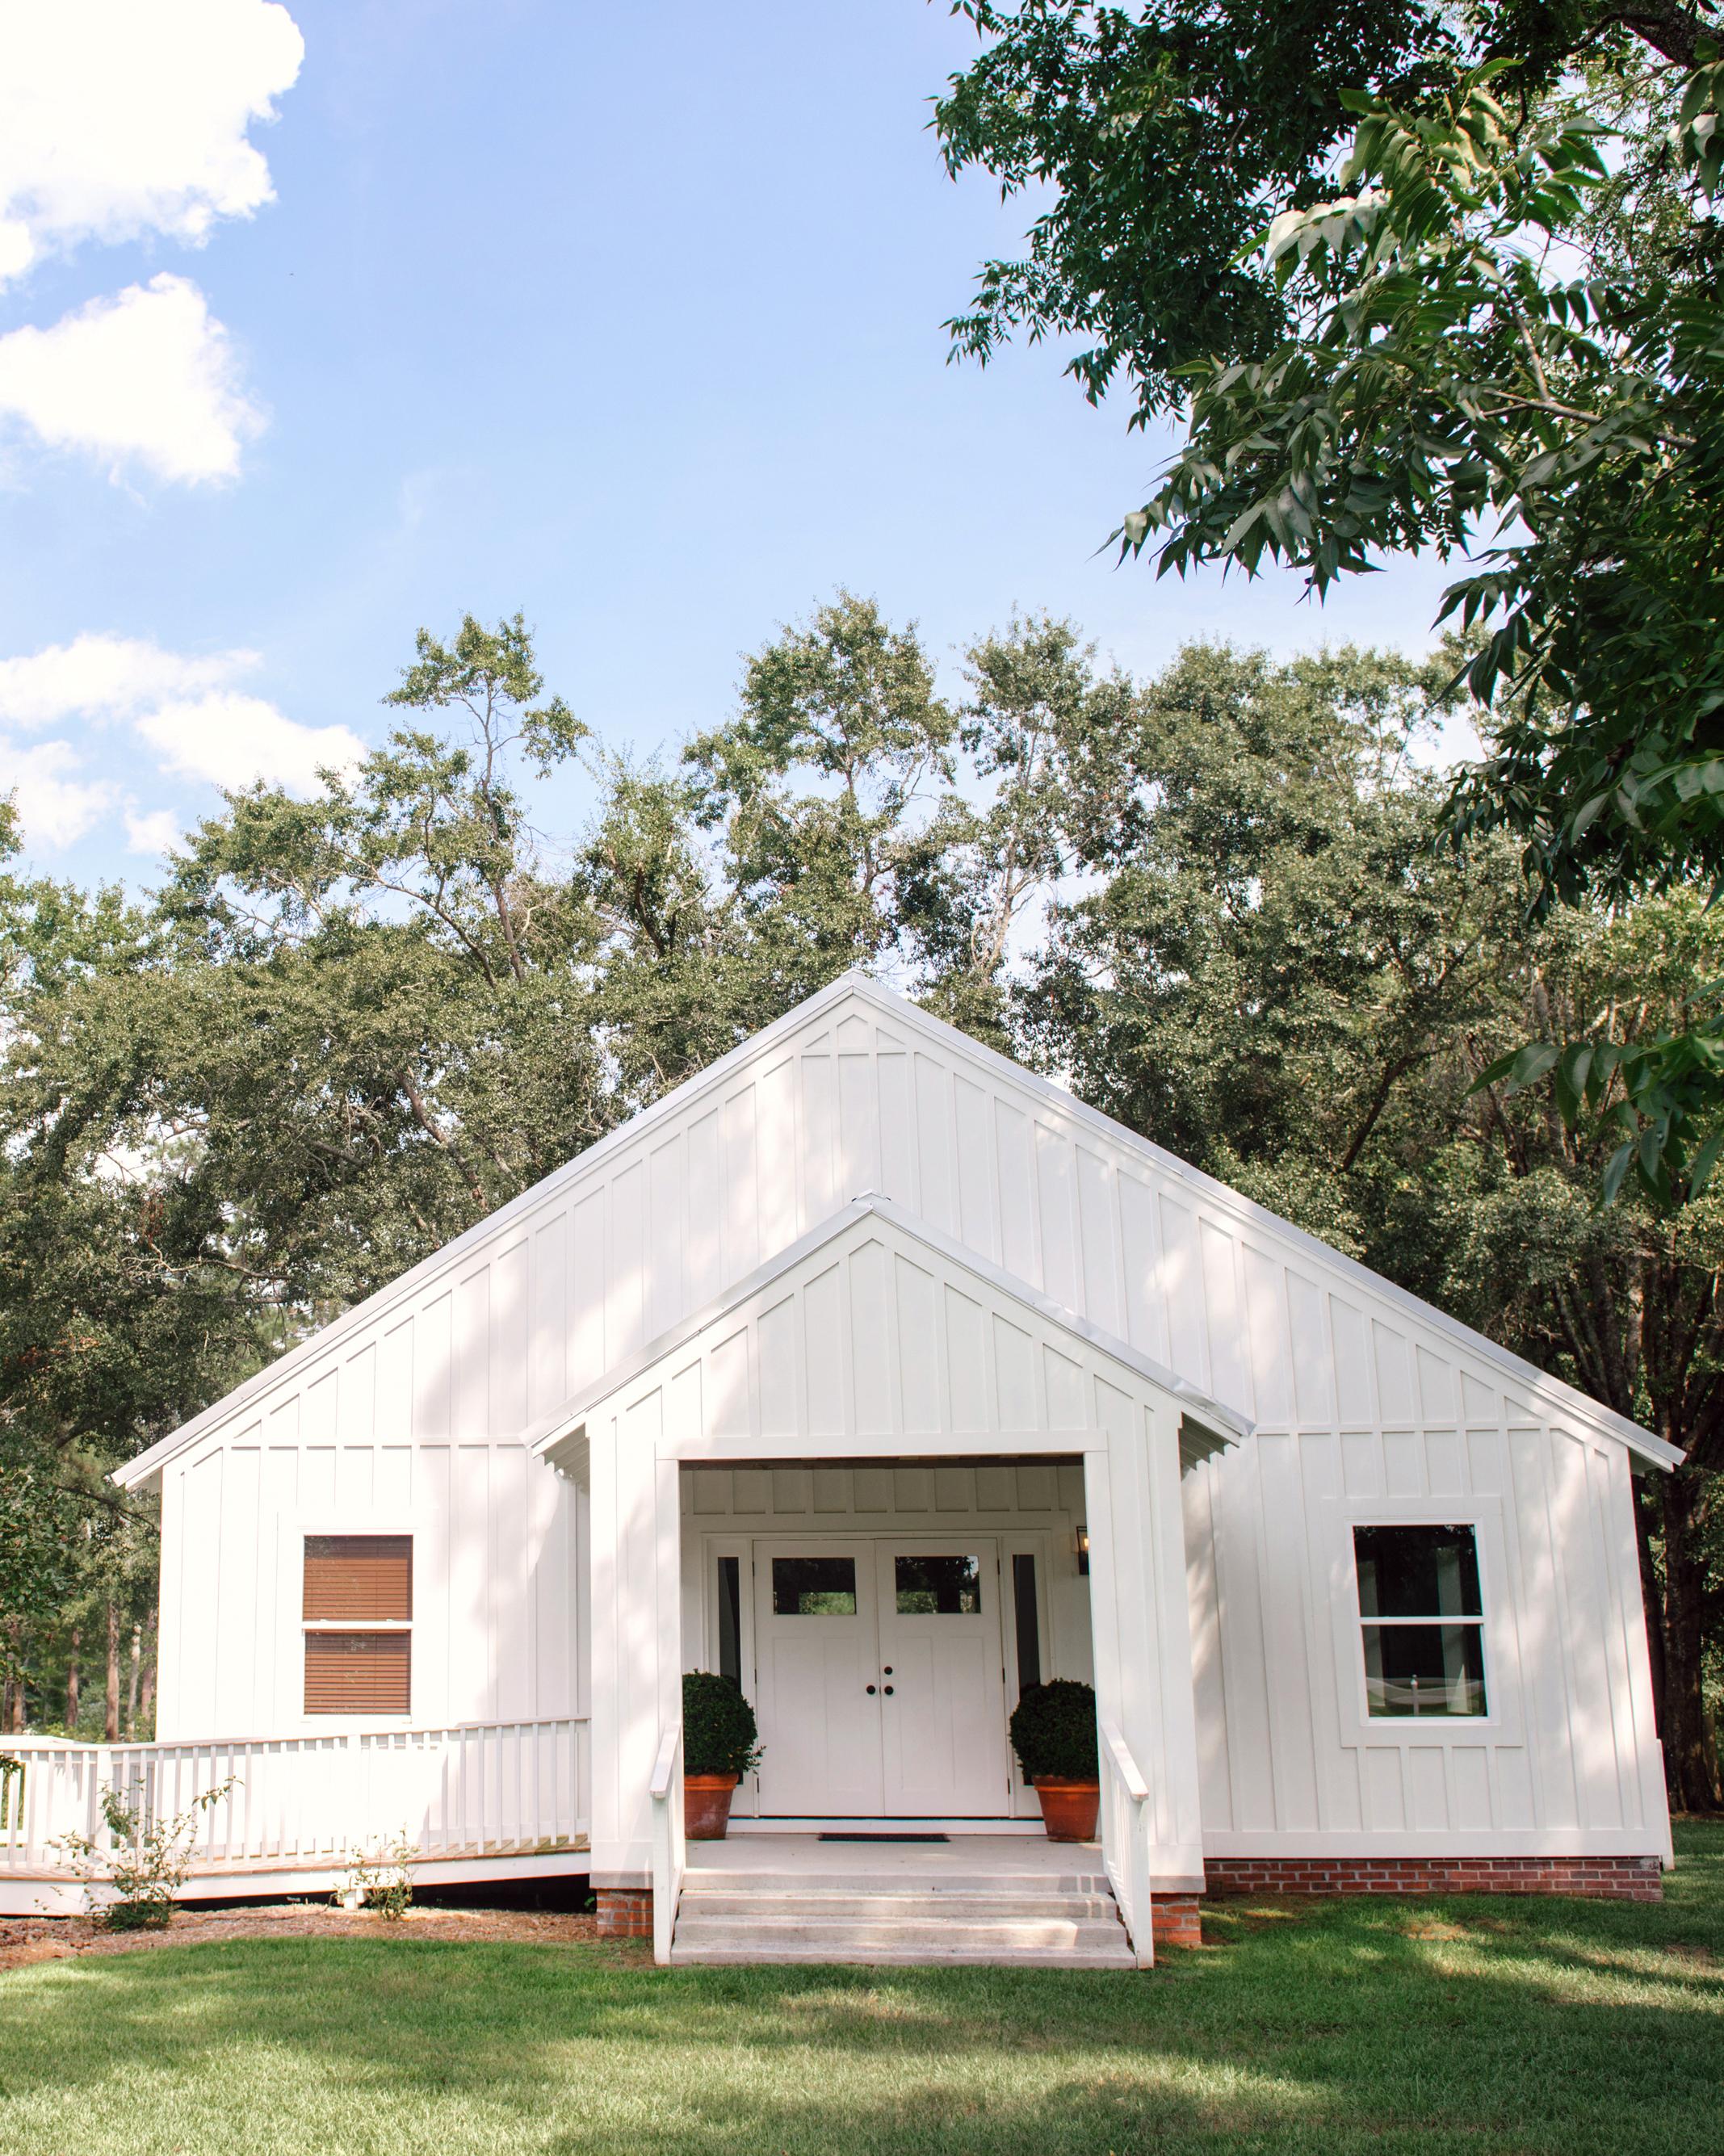 location-scout-wildberry-farm-atkinson-house-1014.jpg